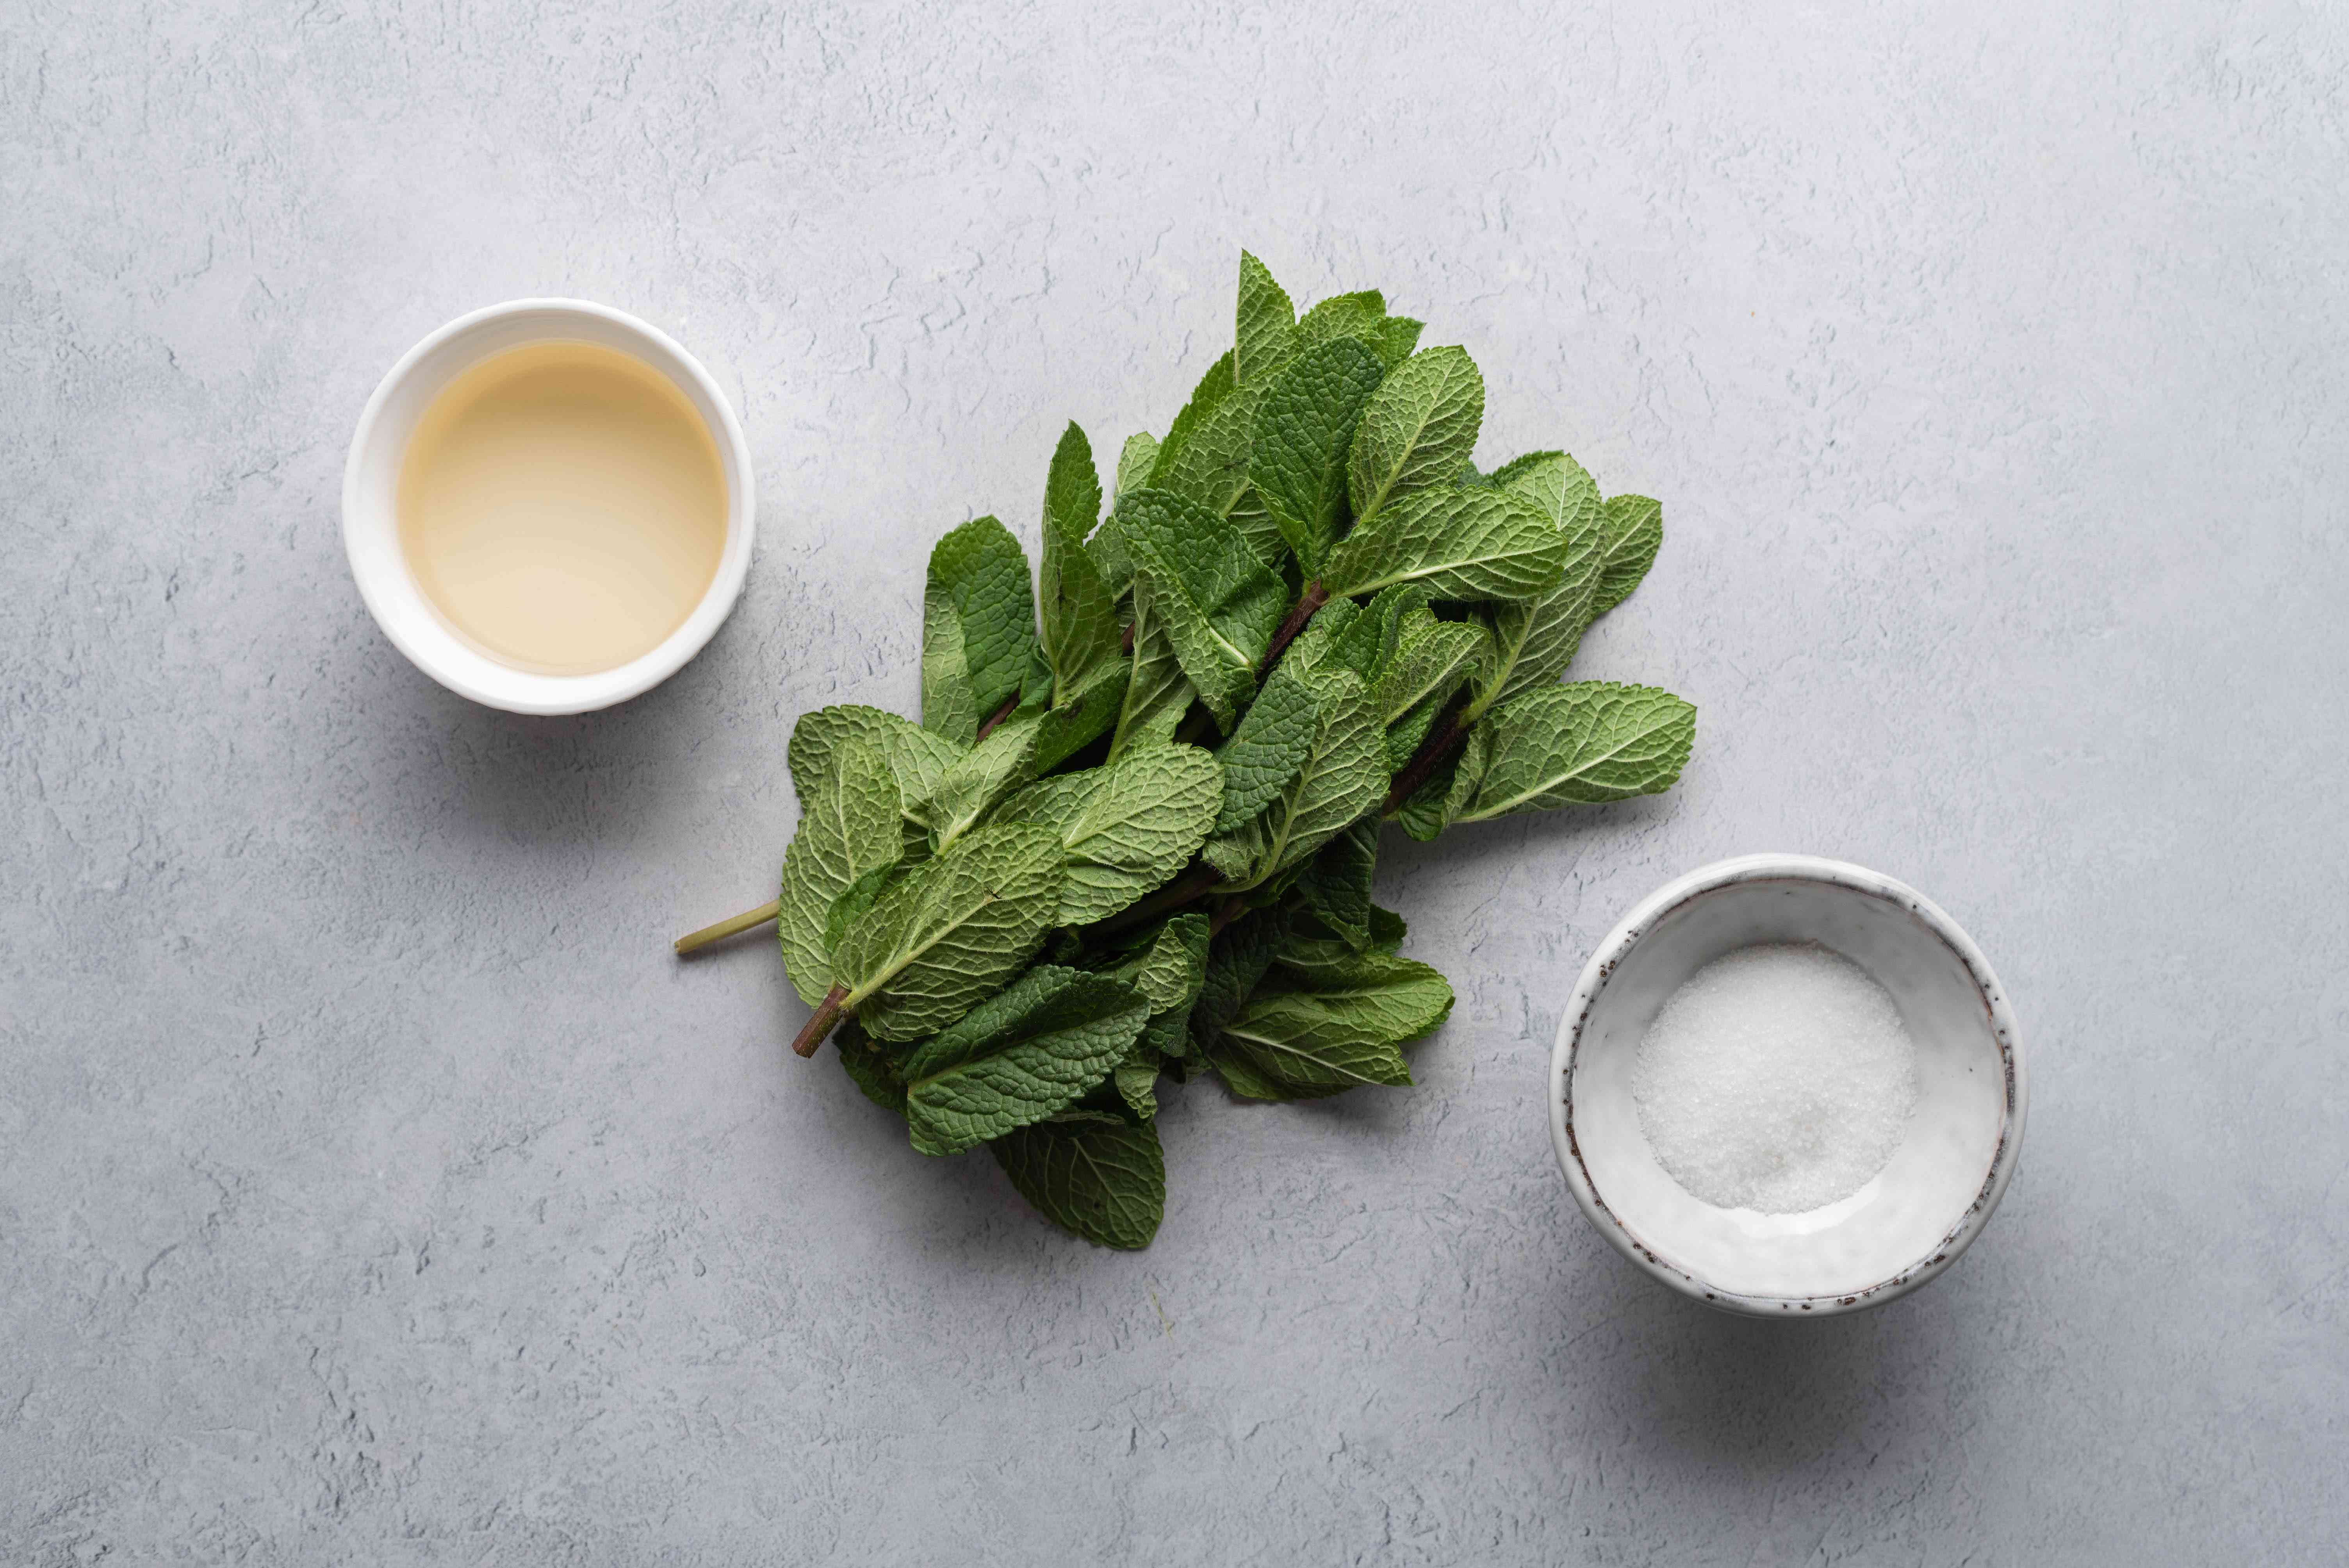 Homemade Mint Sauce ingredients